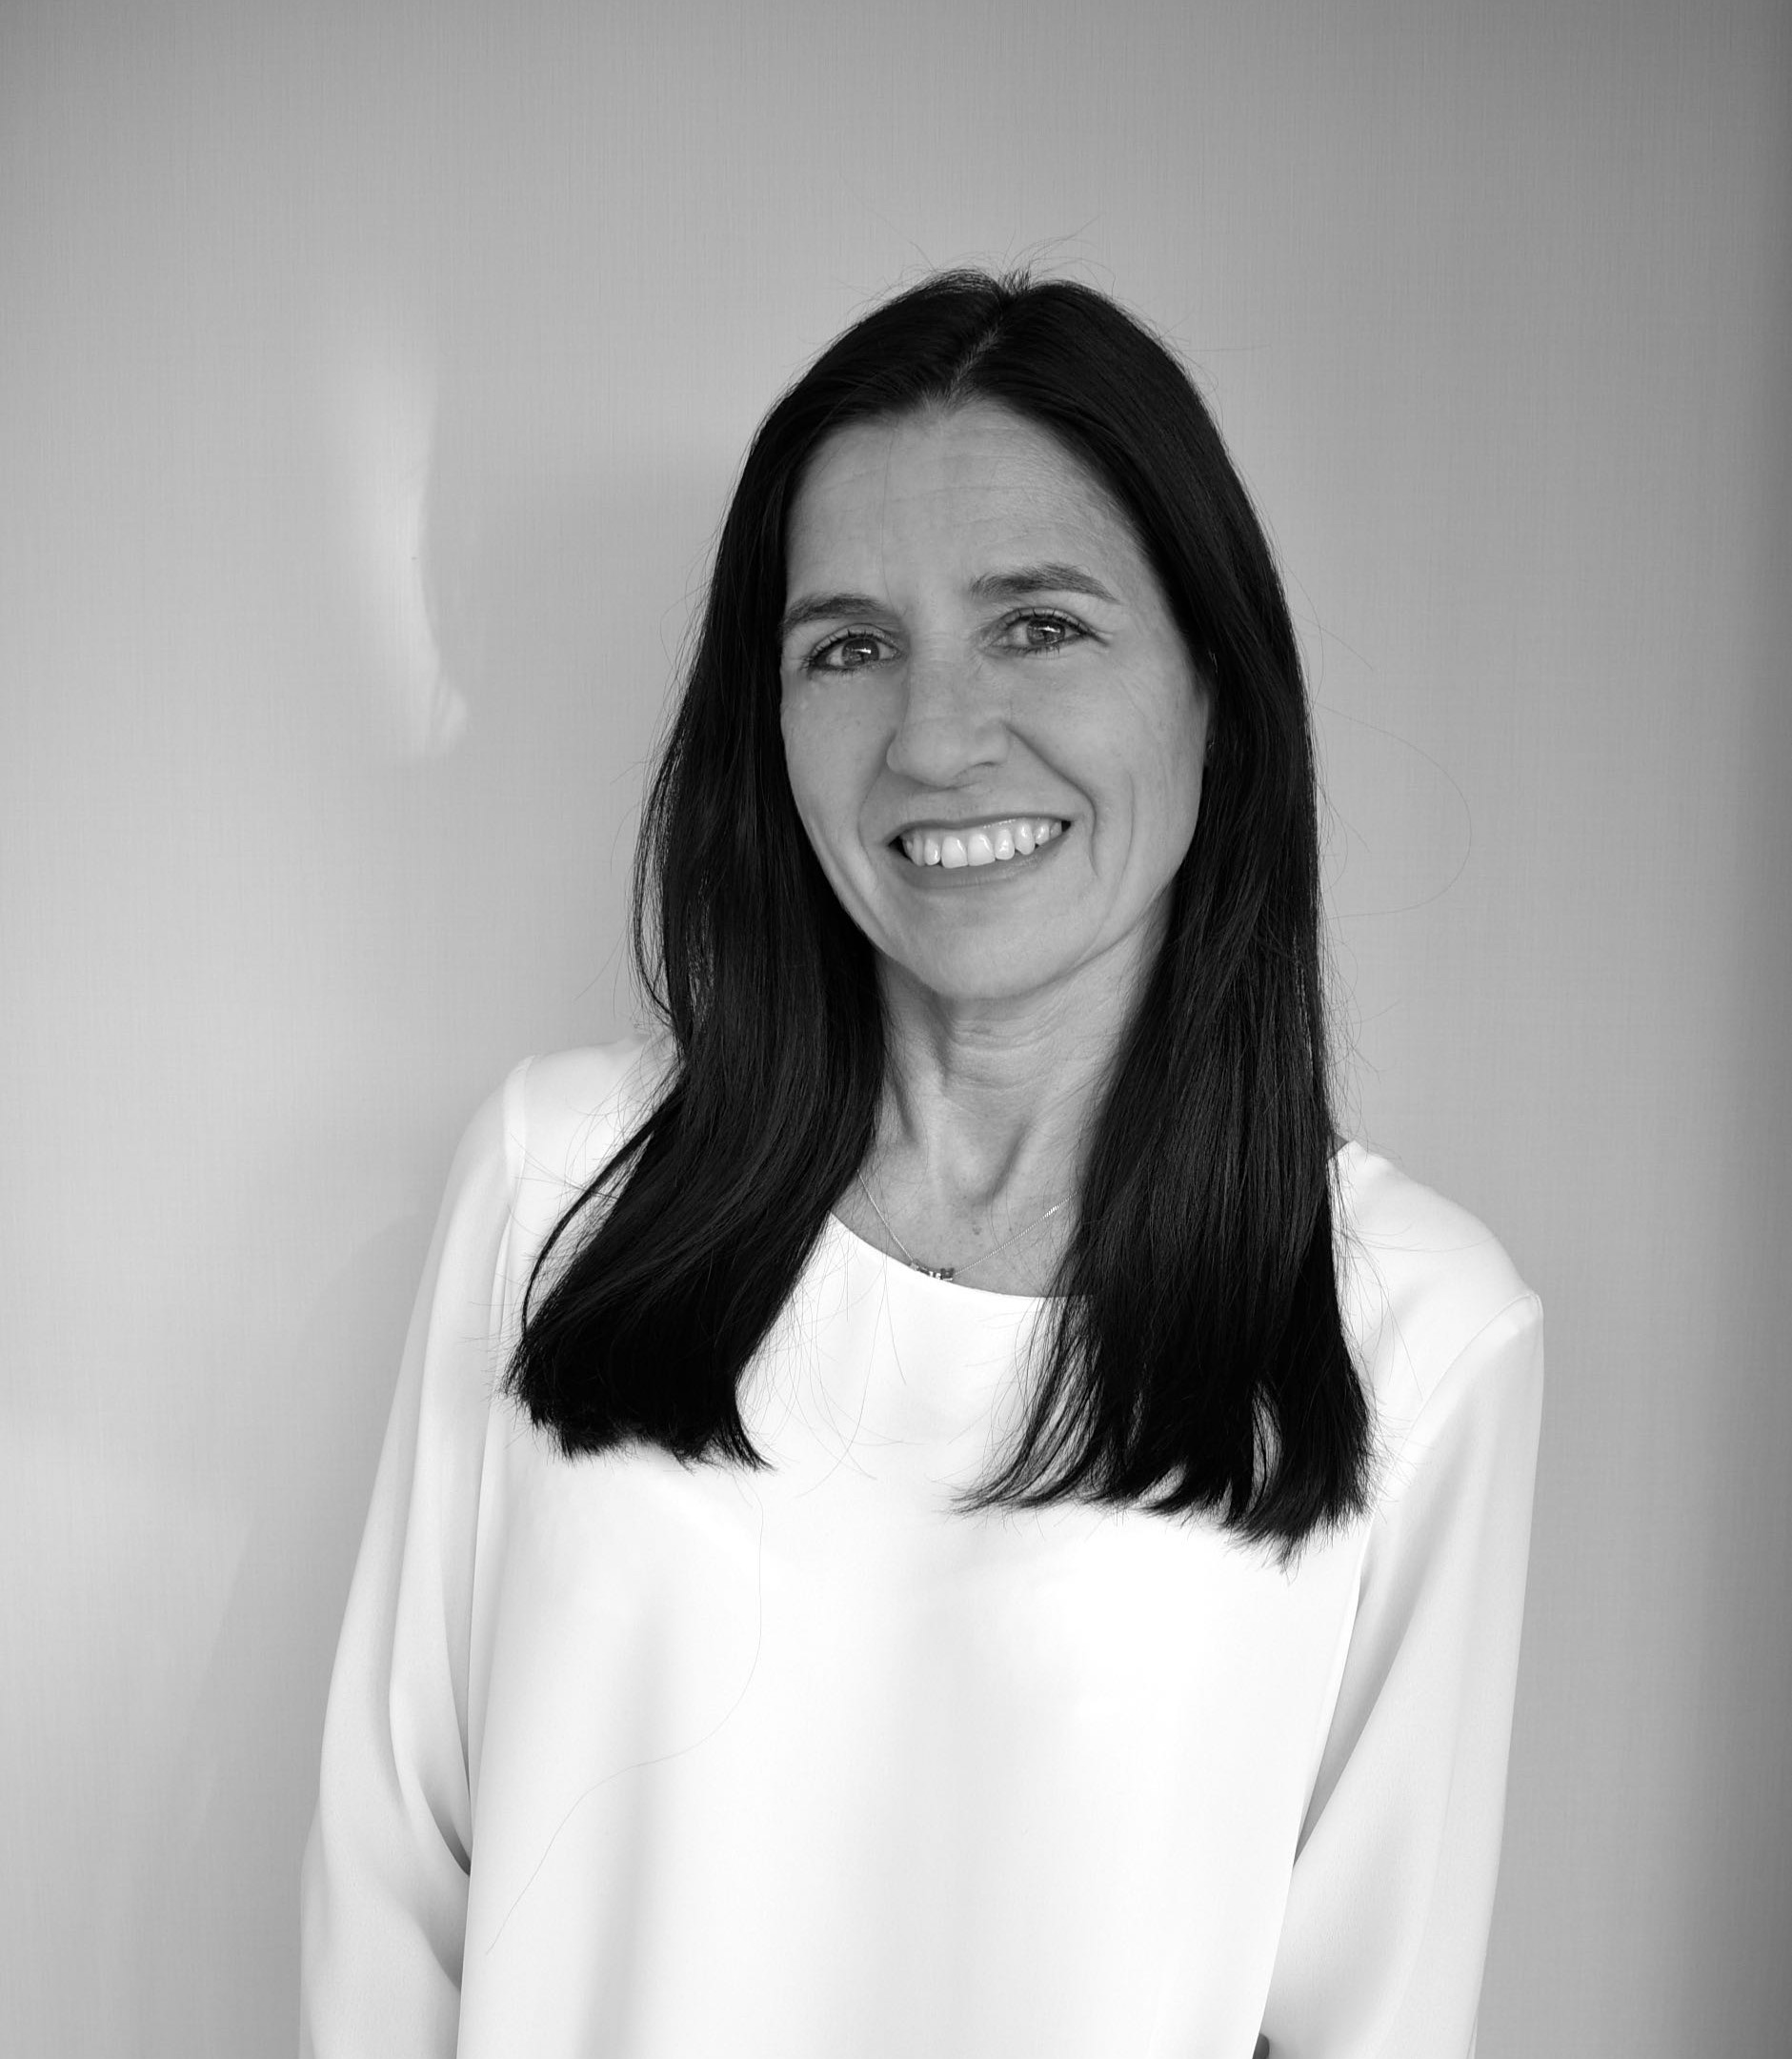 Ana Macías Ojeda